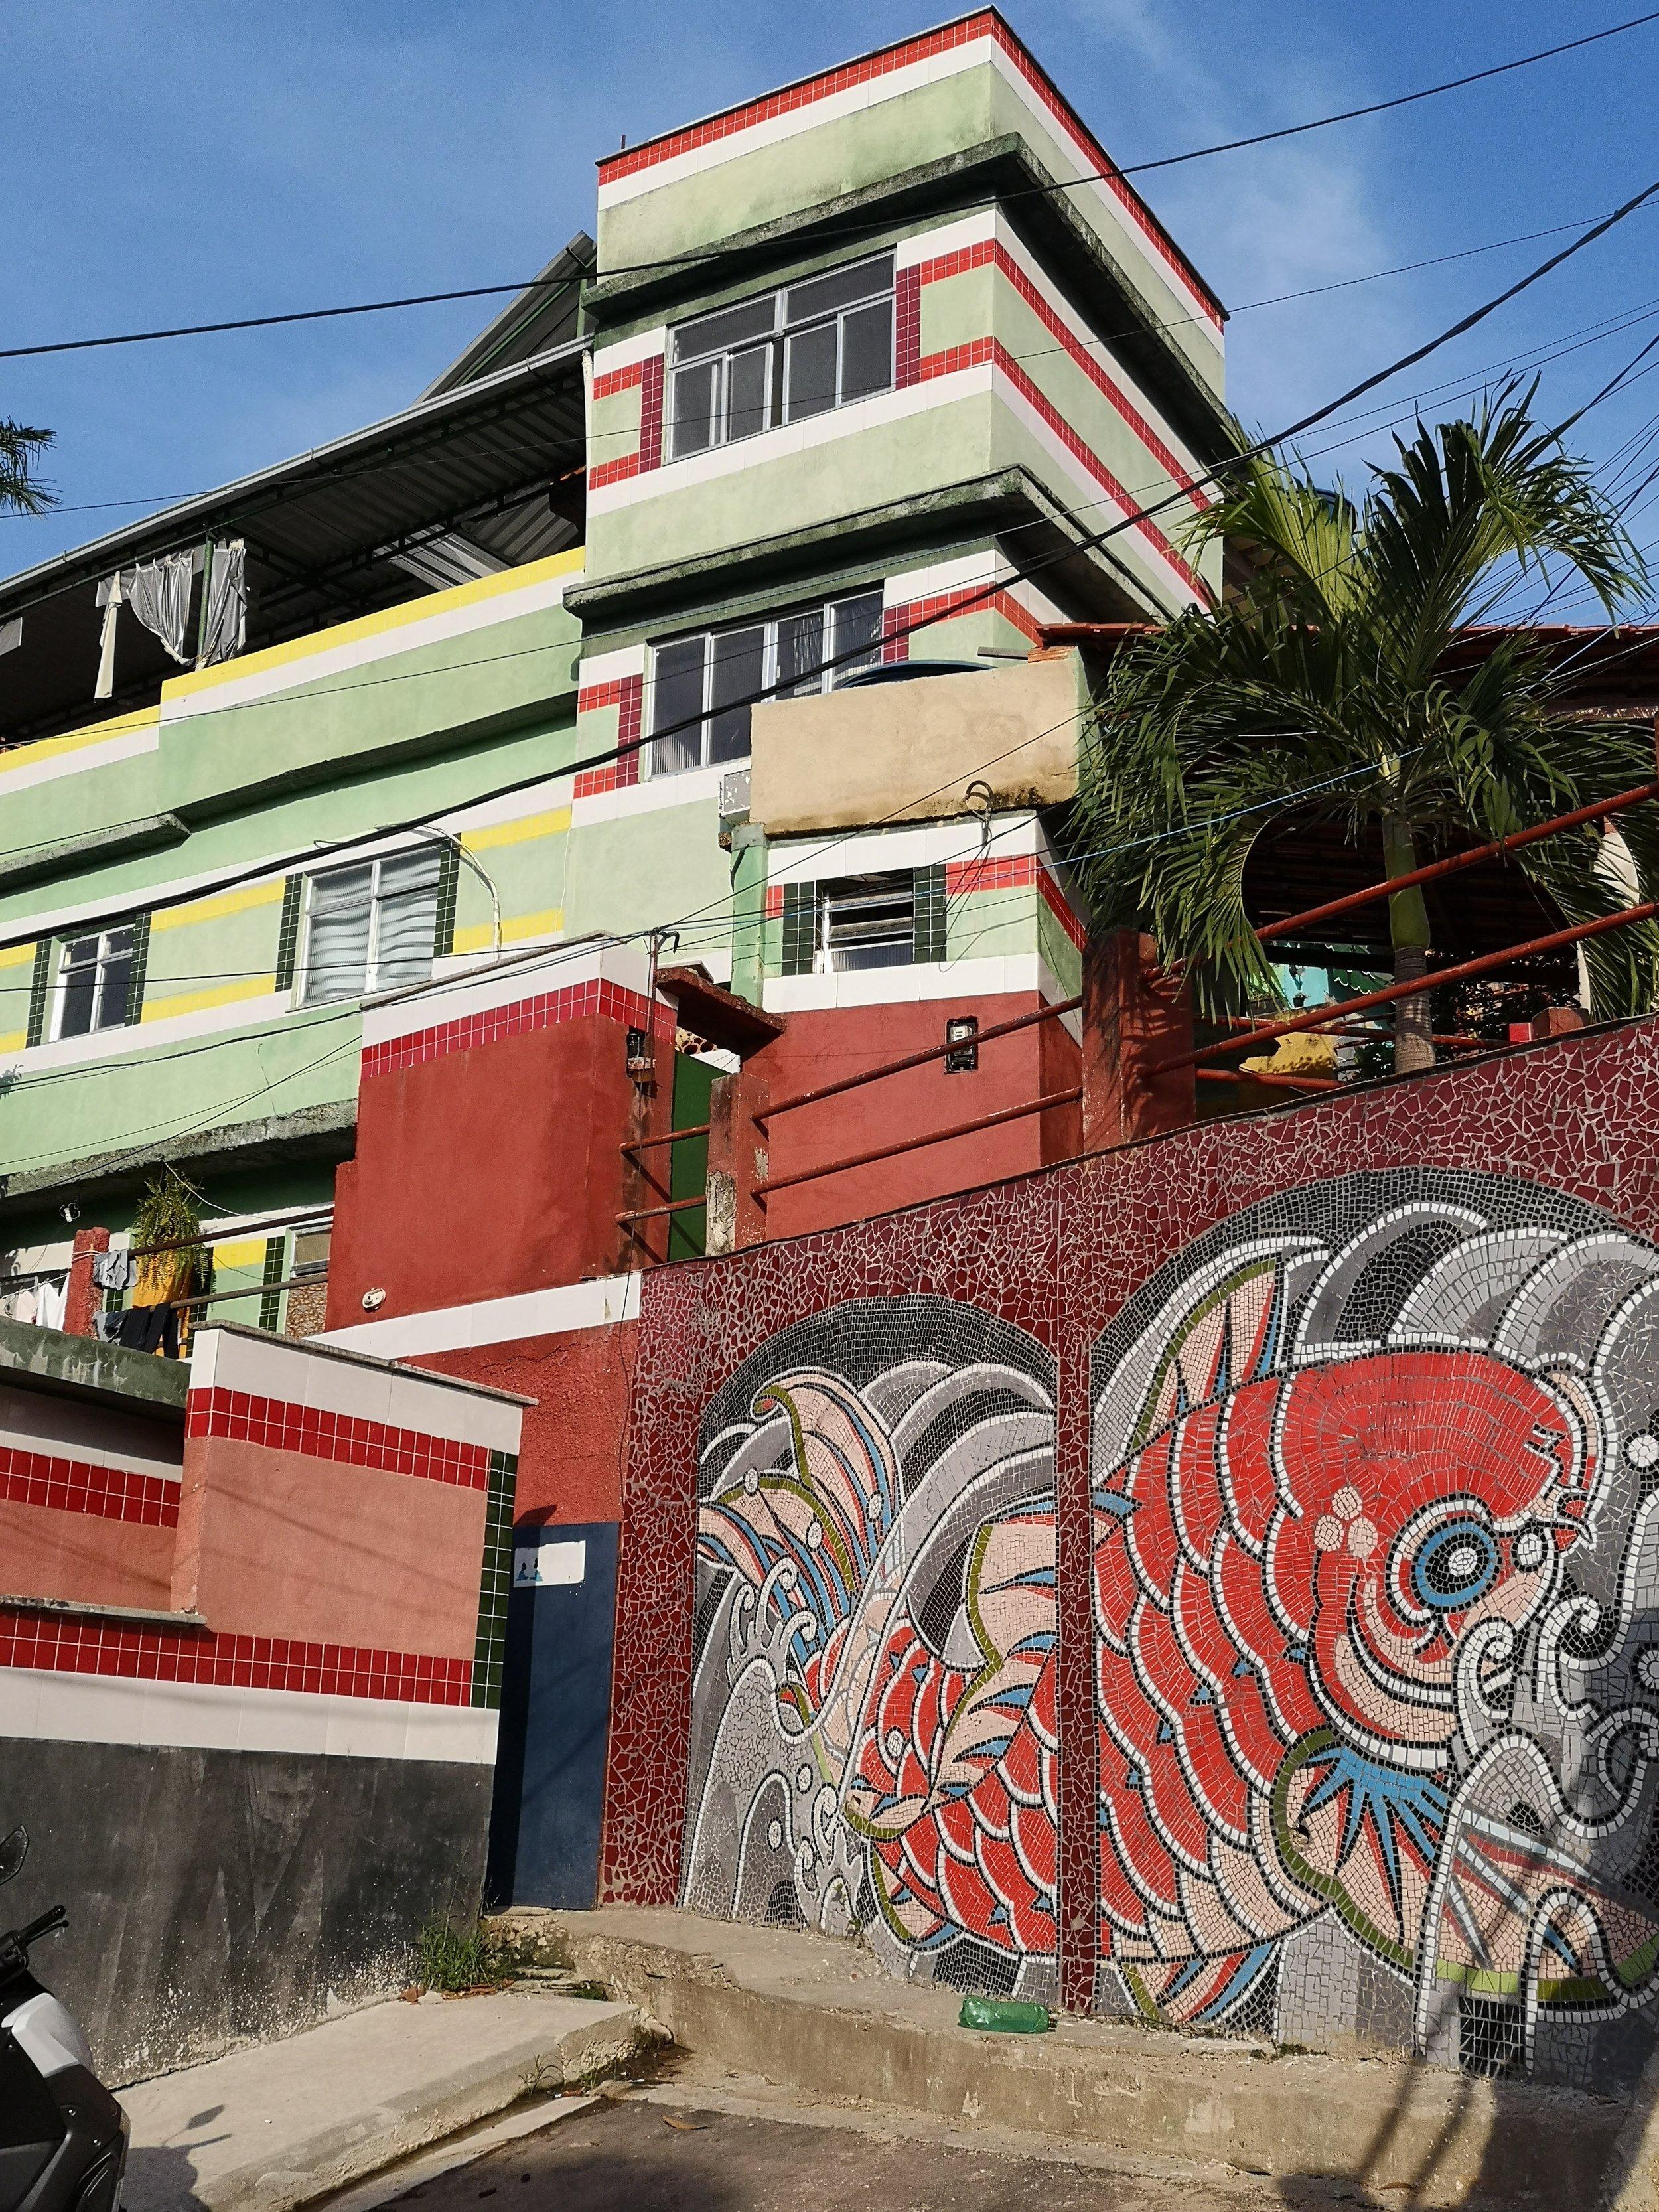 Walking towards the art project in Vila Cruzeiro, we immediately spot some amazing restauration work.